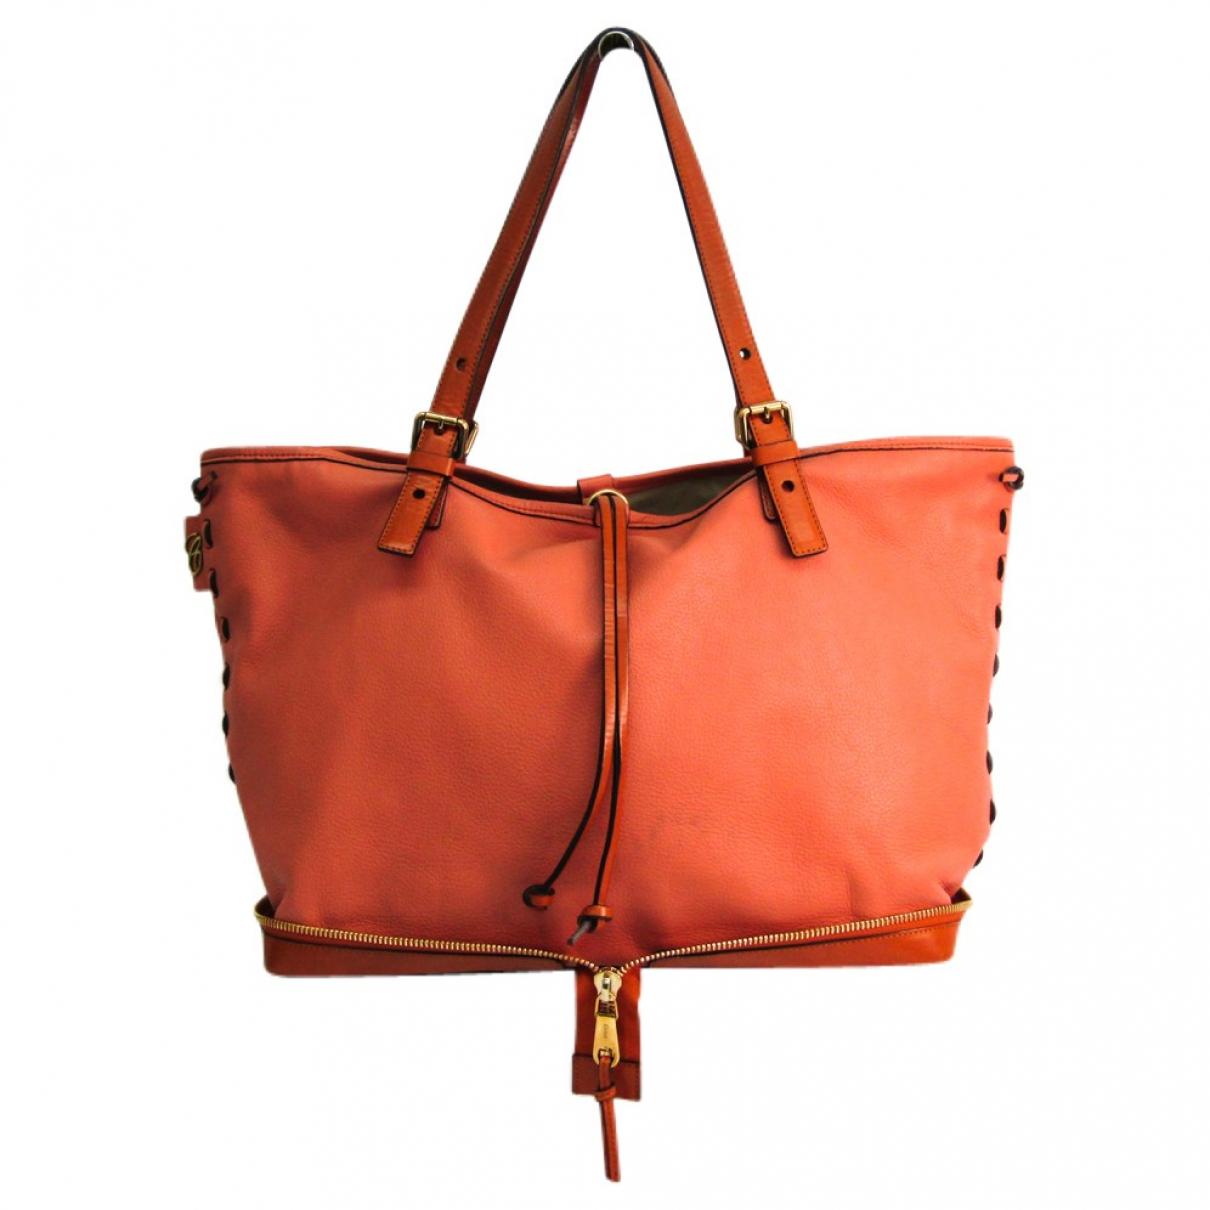 Chloé \N Brown Leather handbag for Women \N